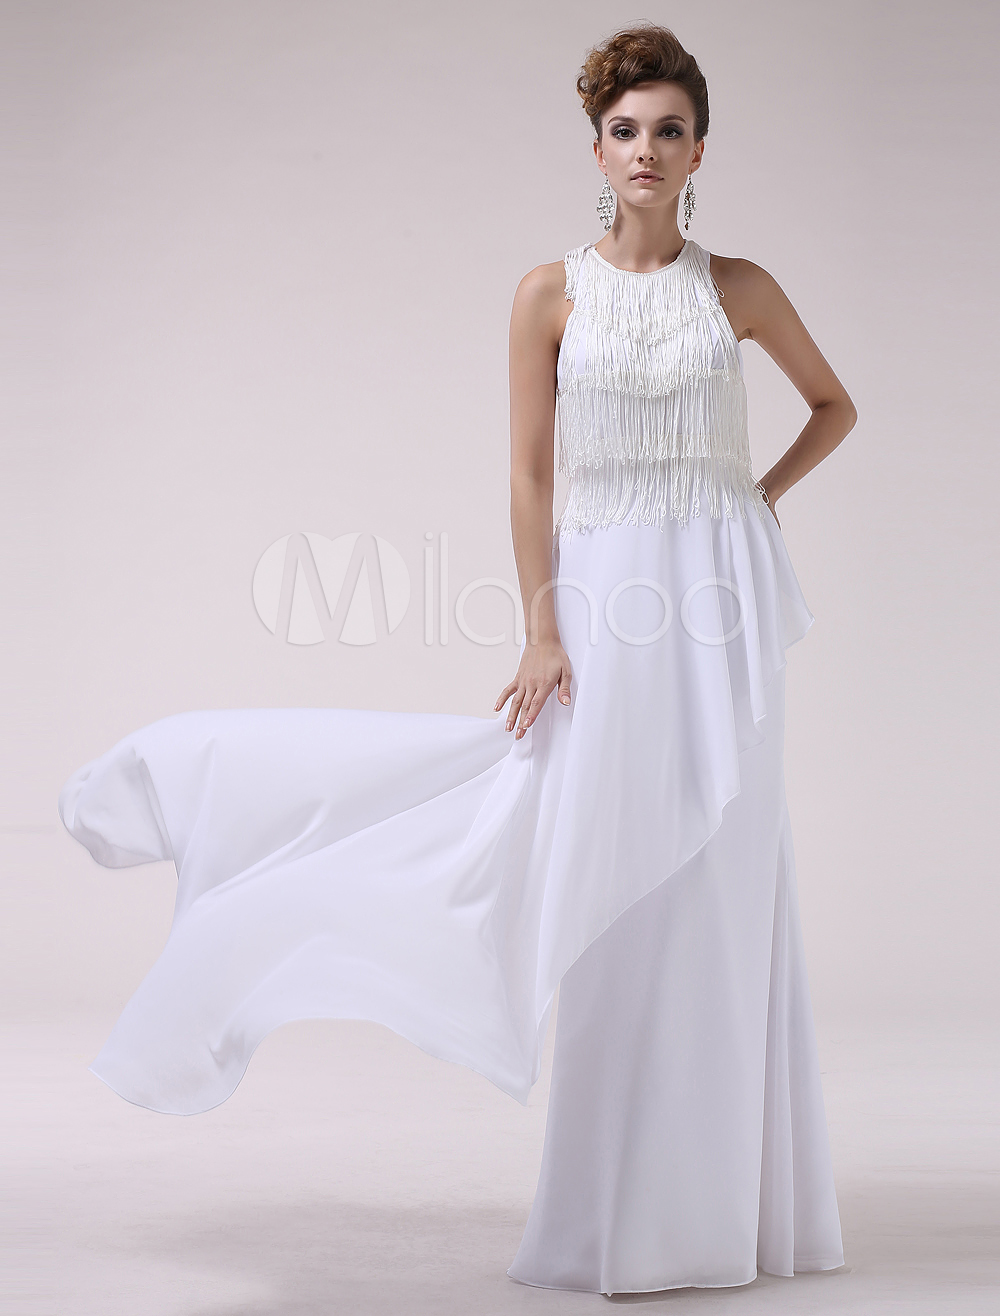 White Jewel Neck Tassel A-line Sleeveless Chiffon Evening Dress Milanoo (Wedding Evening Dresses) photo